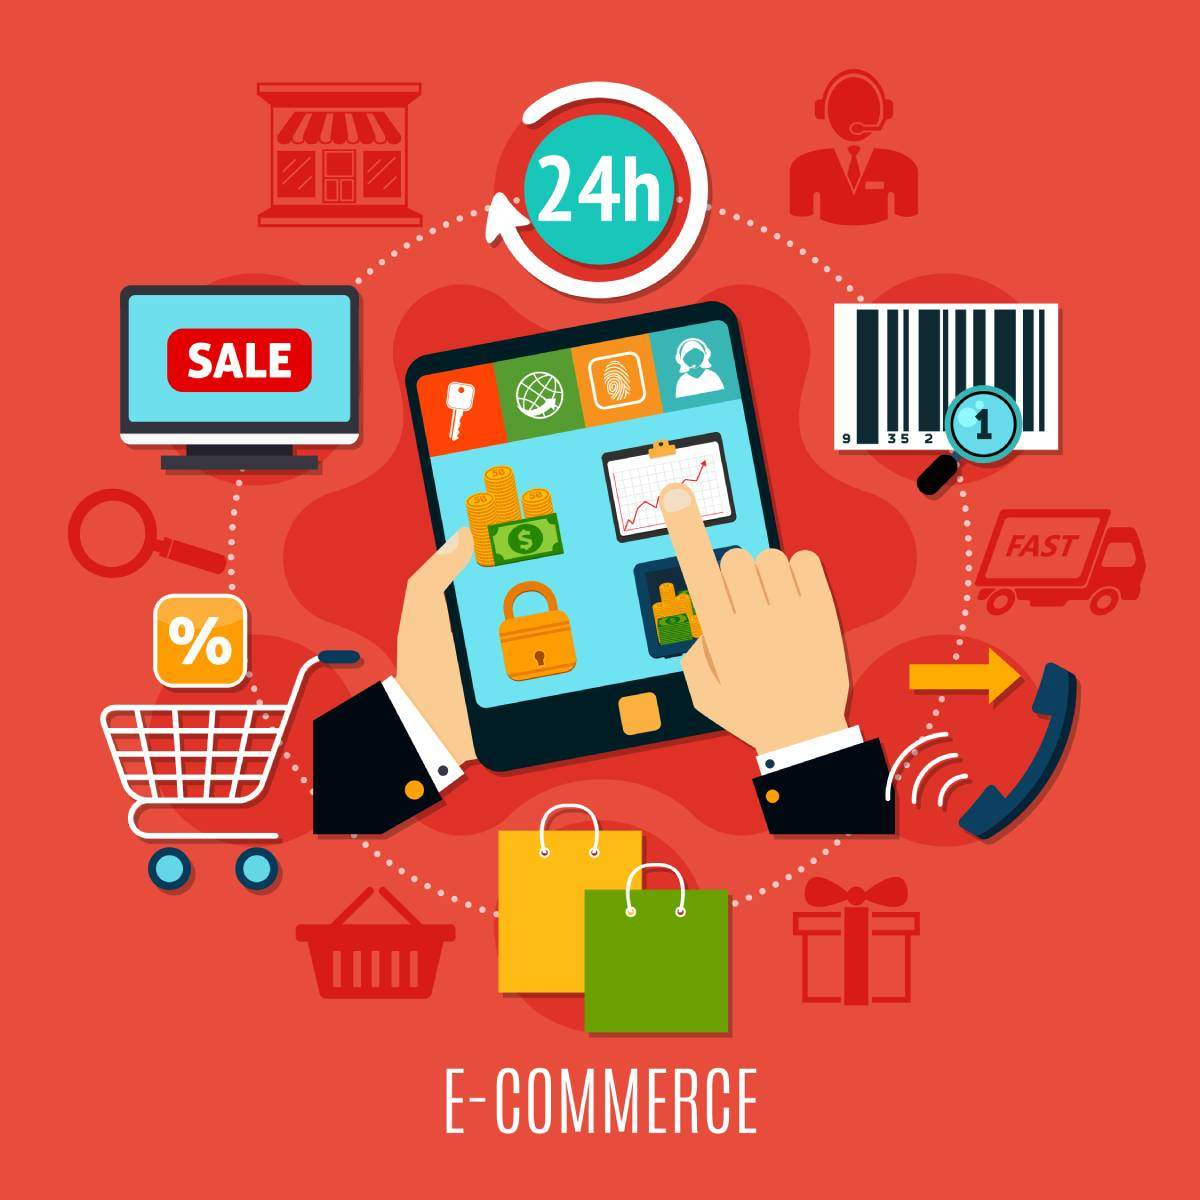 platforma sklepu internetowego